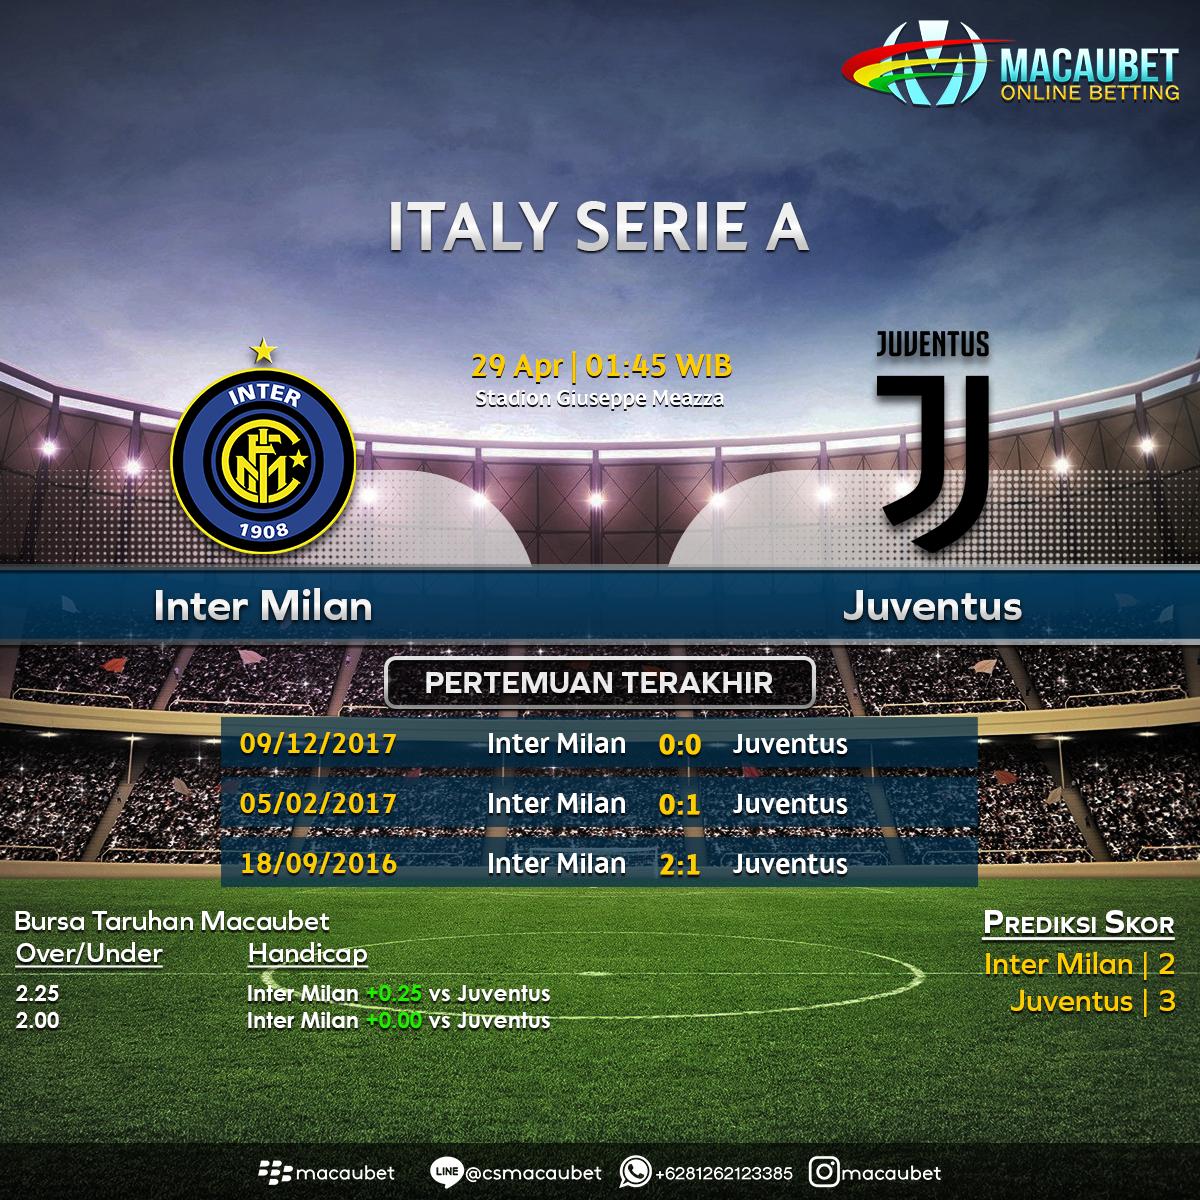 Macaubet Macaubetonline Soccer News Sport Sepakbola Football